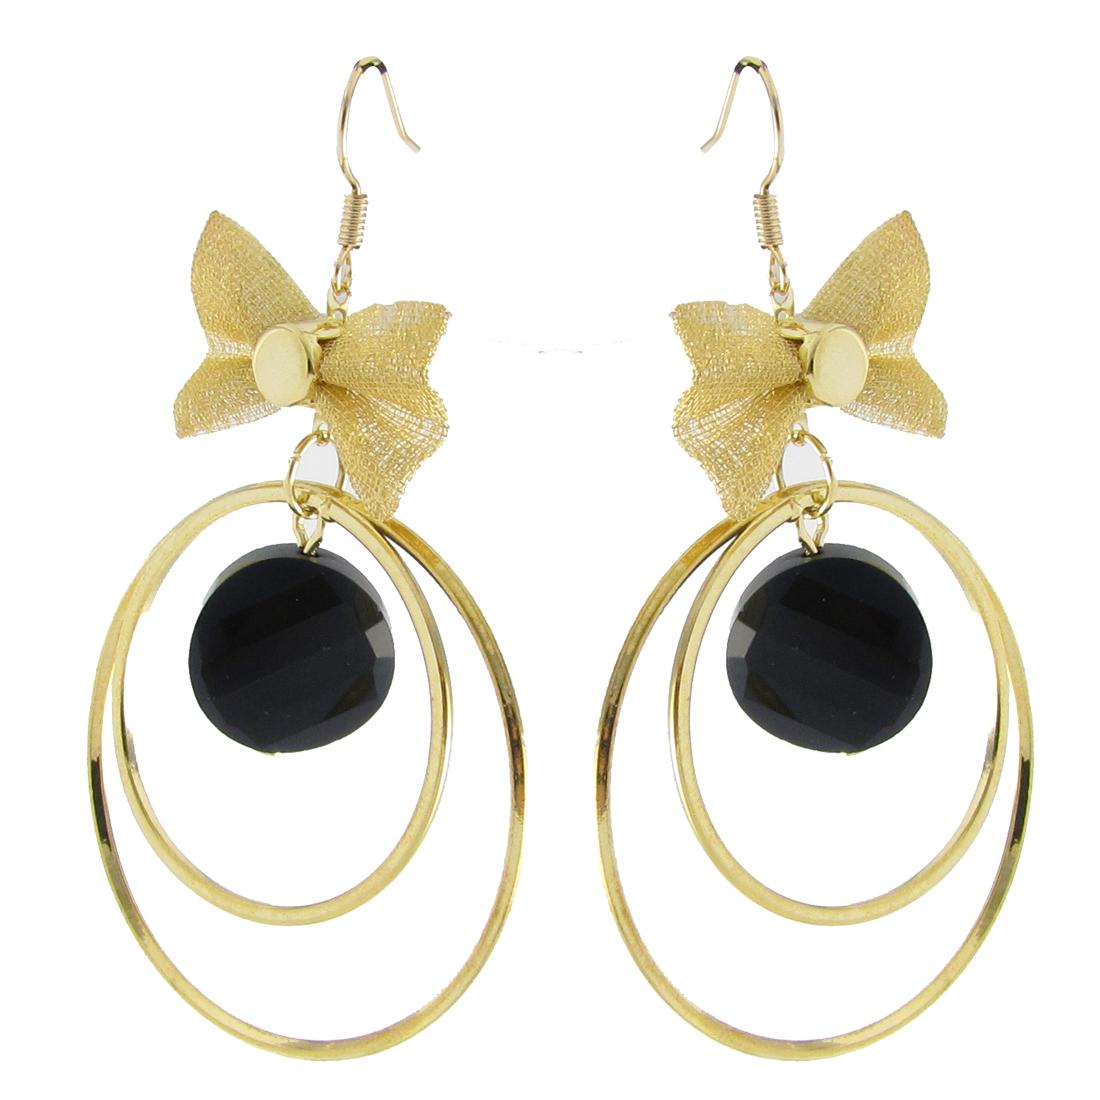 Metal Mesh Bow Tie Gold Tone 2 Circles Pendant Dangling Fish Hook Earrings Pair